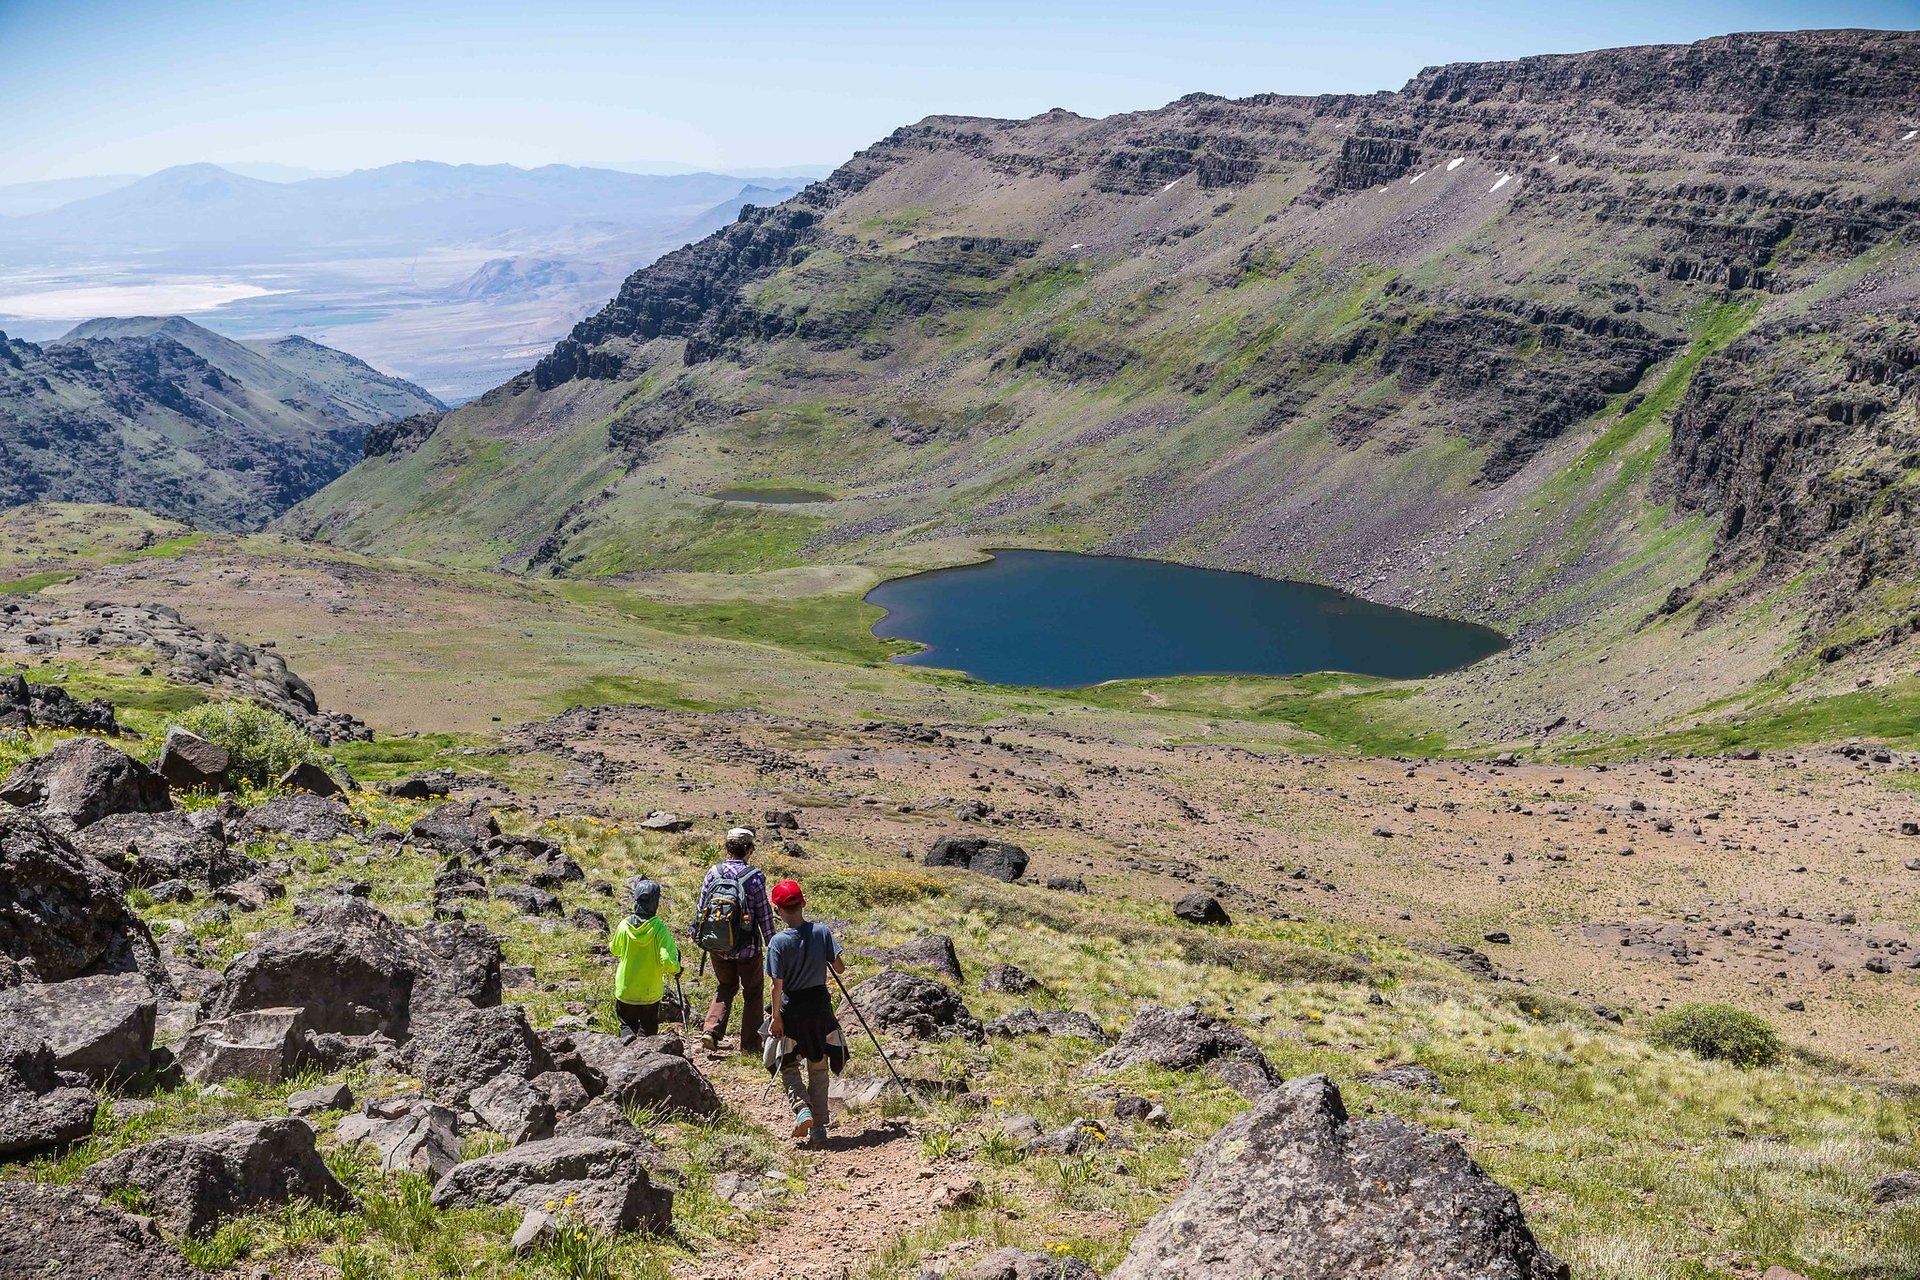 Wildhorse Lake in Oregon 2020 - Best Time